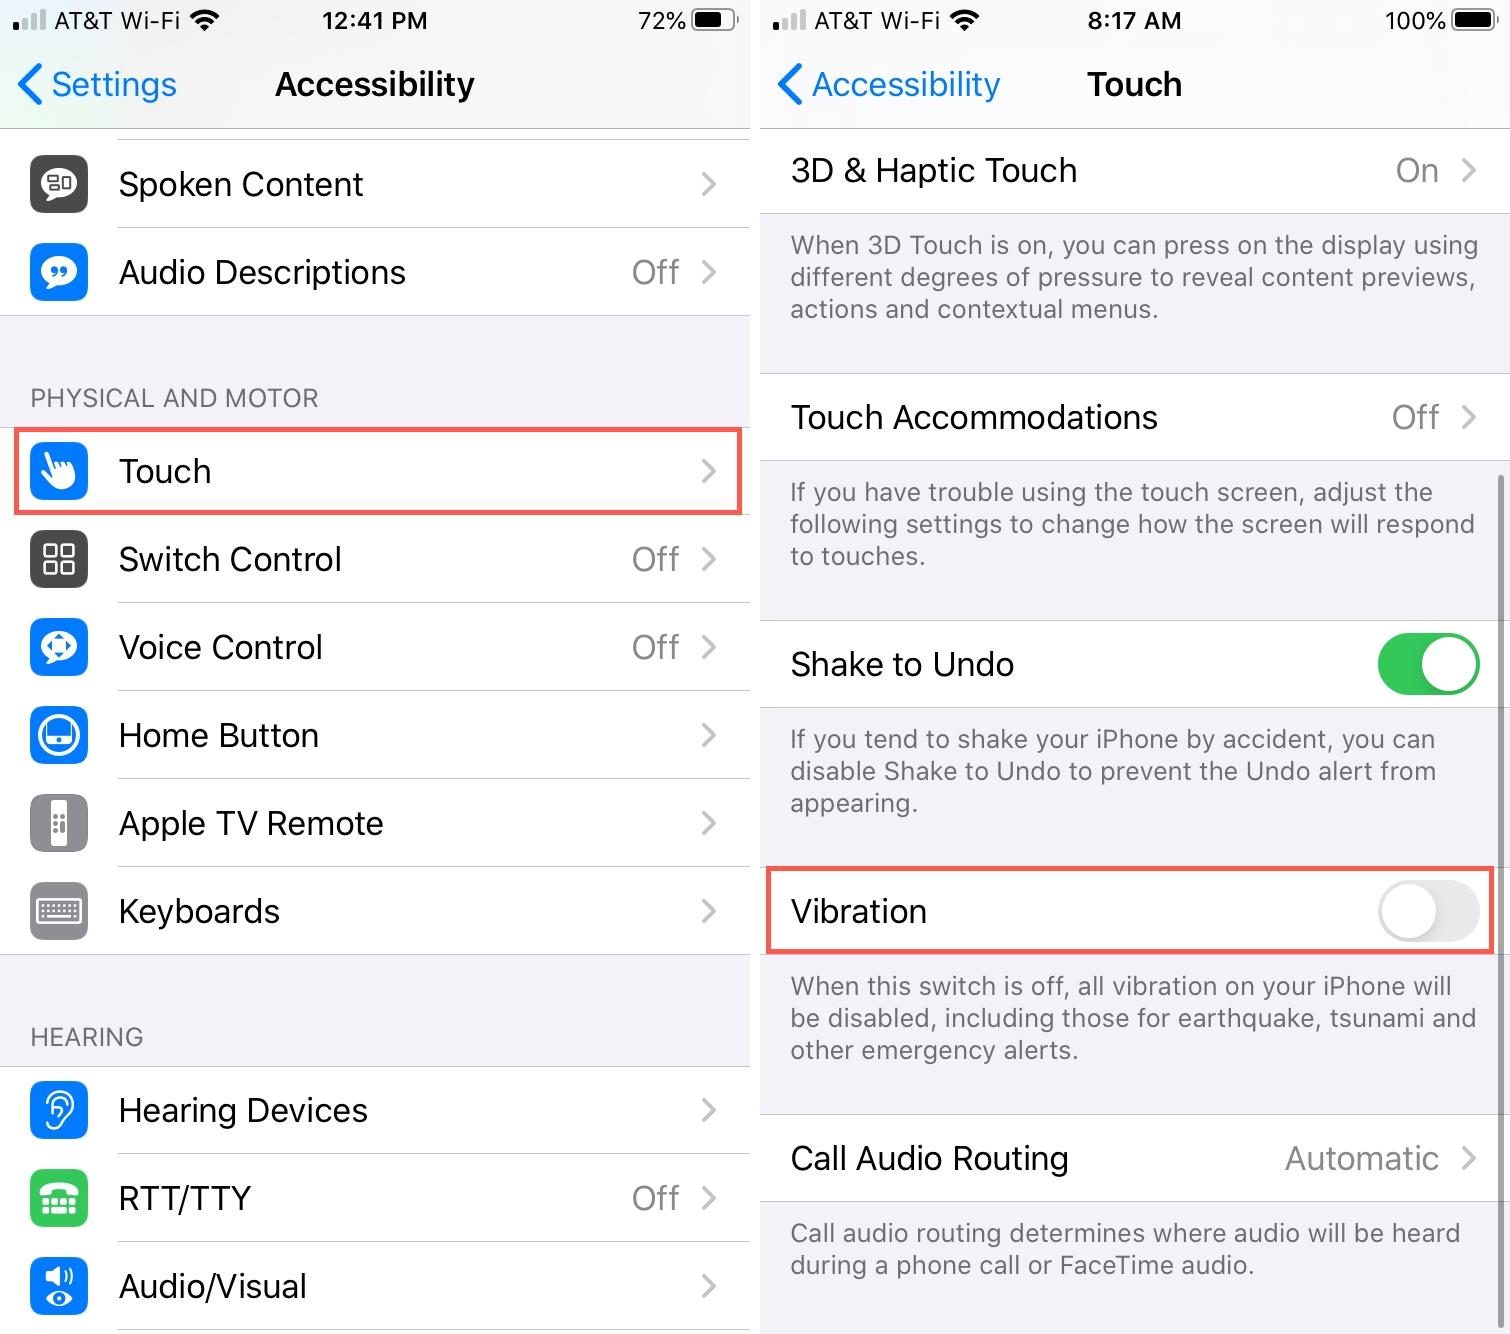 Accesibilidad Touch Vibration